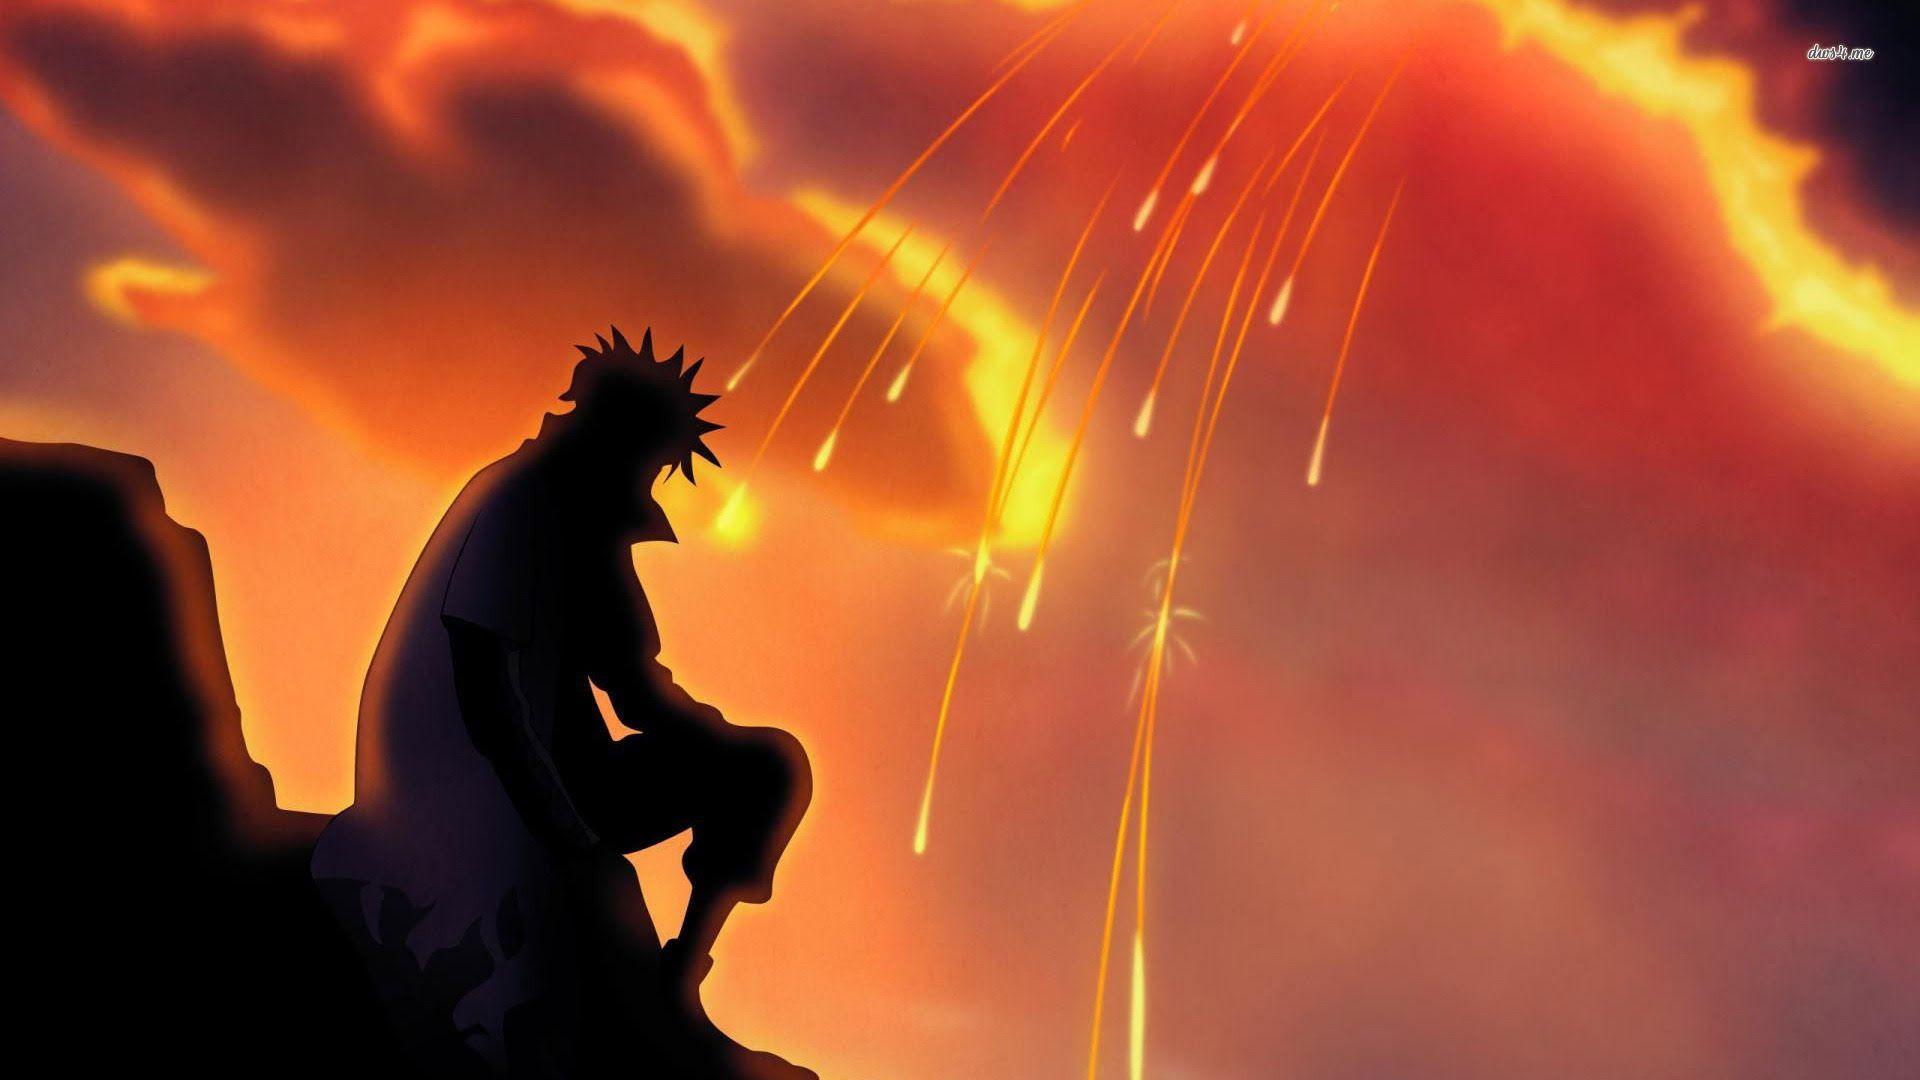 Naruto Shippuuden AMV Last Goodbye Wallpaper naruto